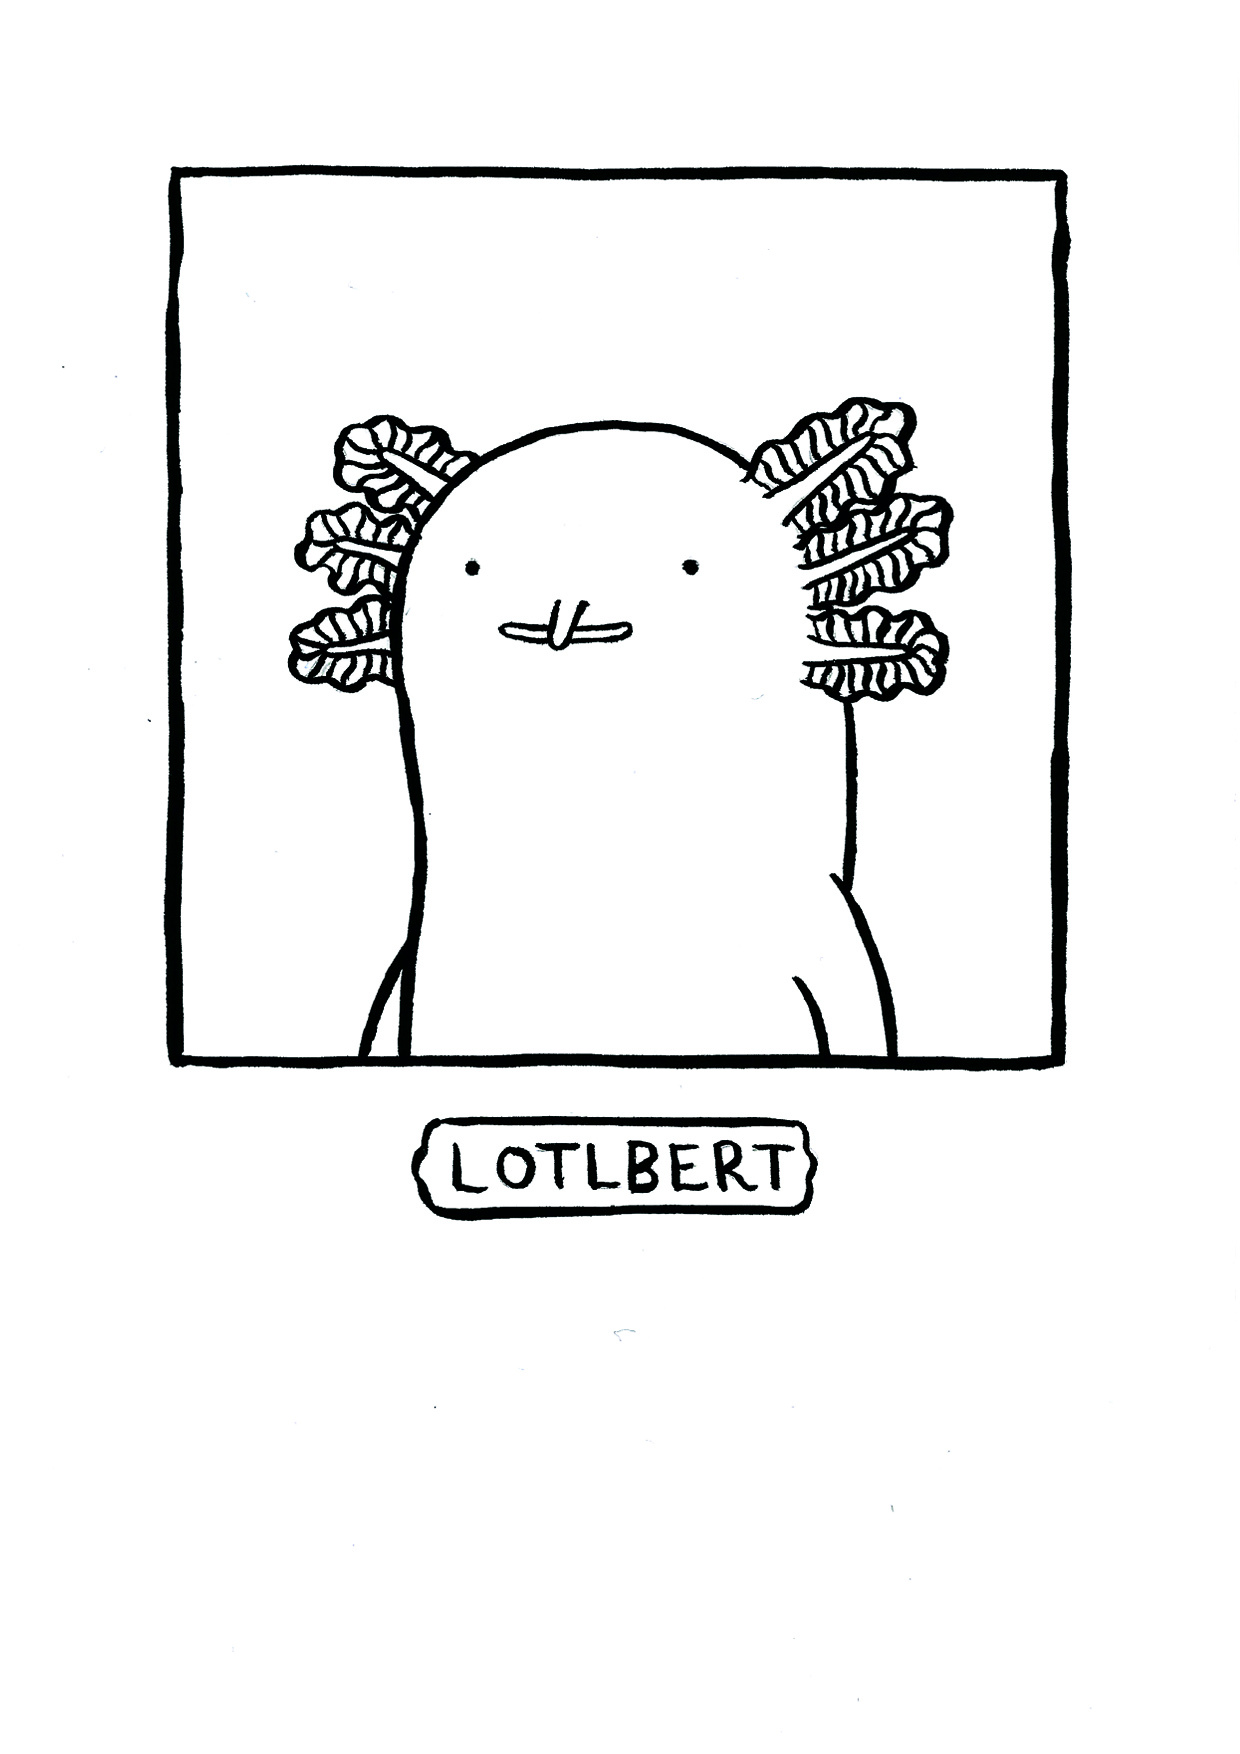 Lotlbert